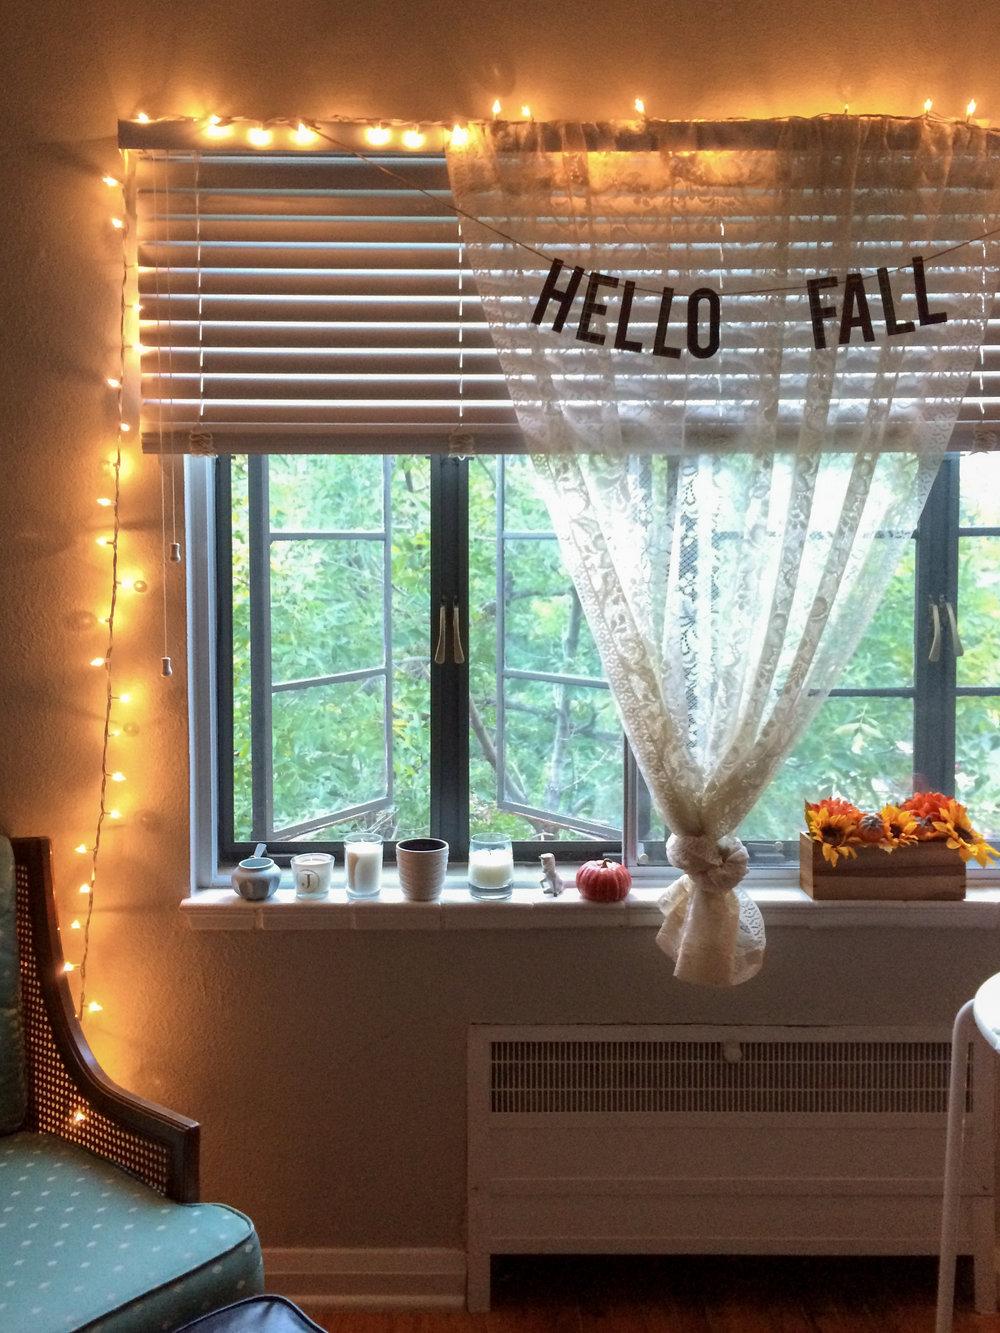 October Goals - AVintageJoy